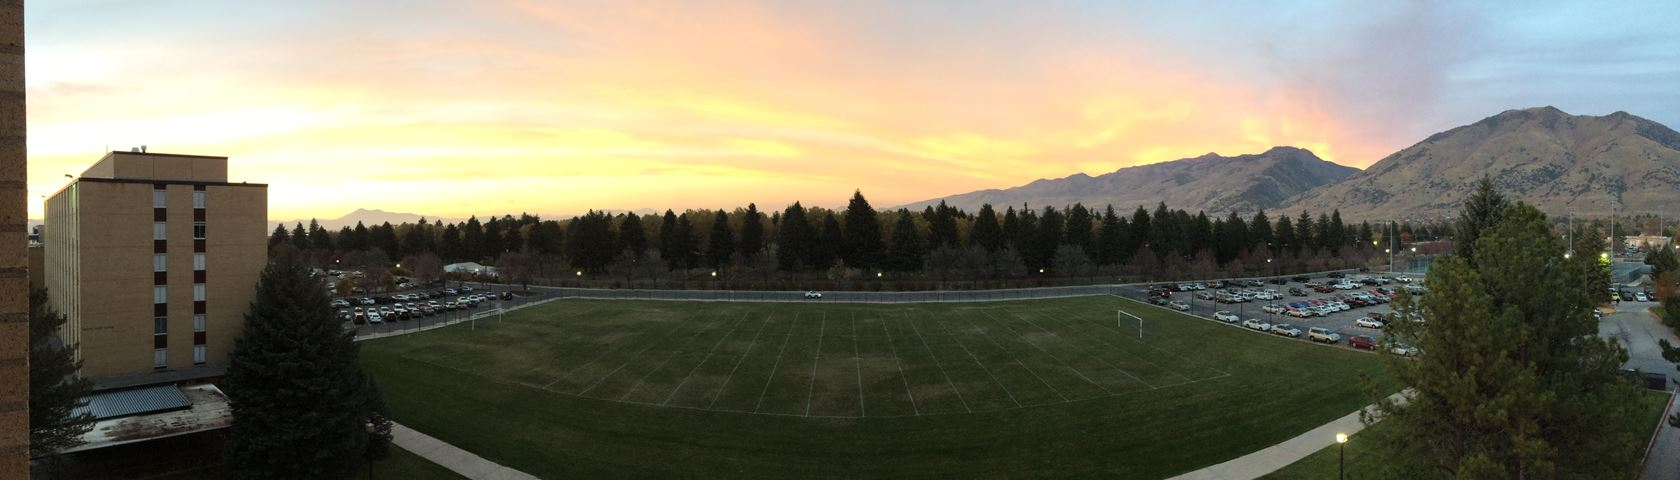 Another Utah State University Panoramic